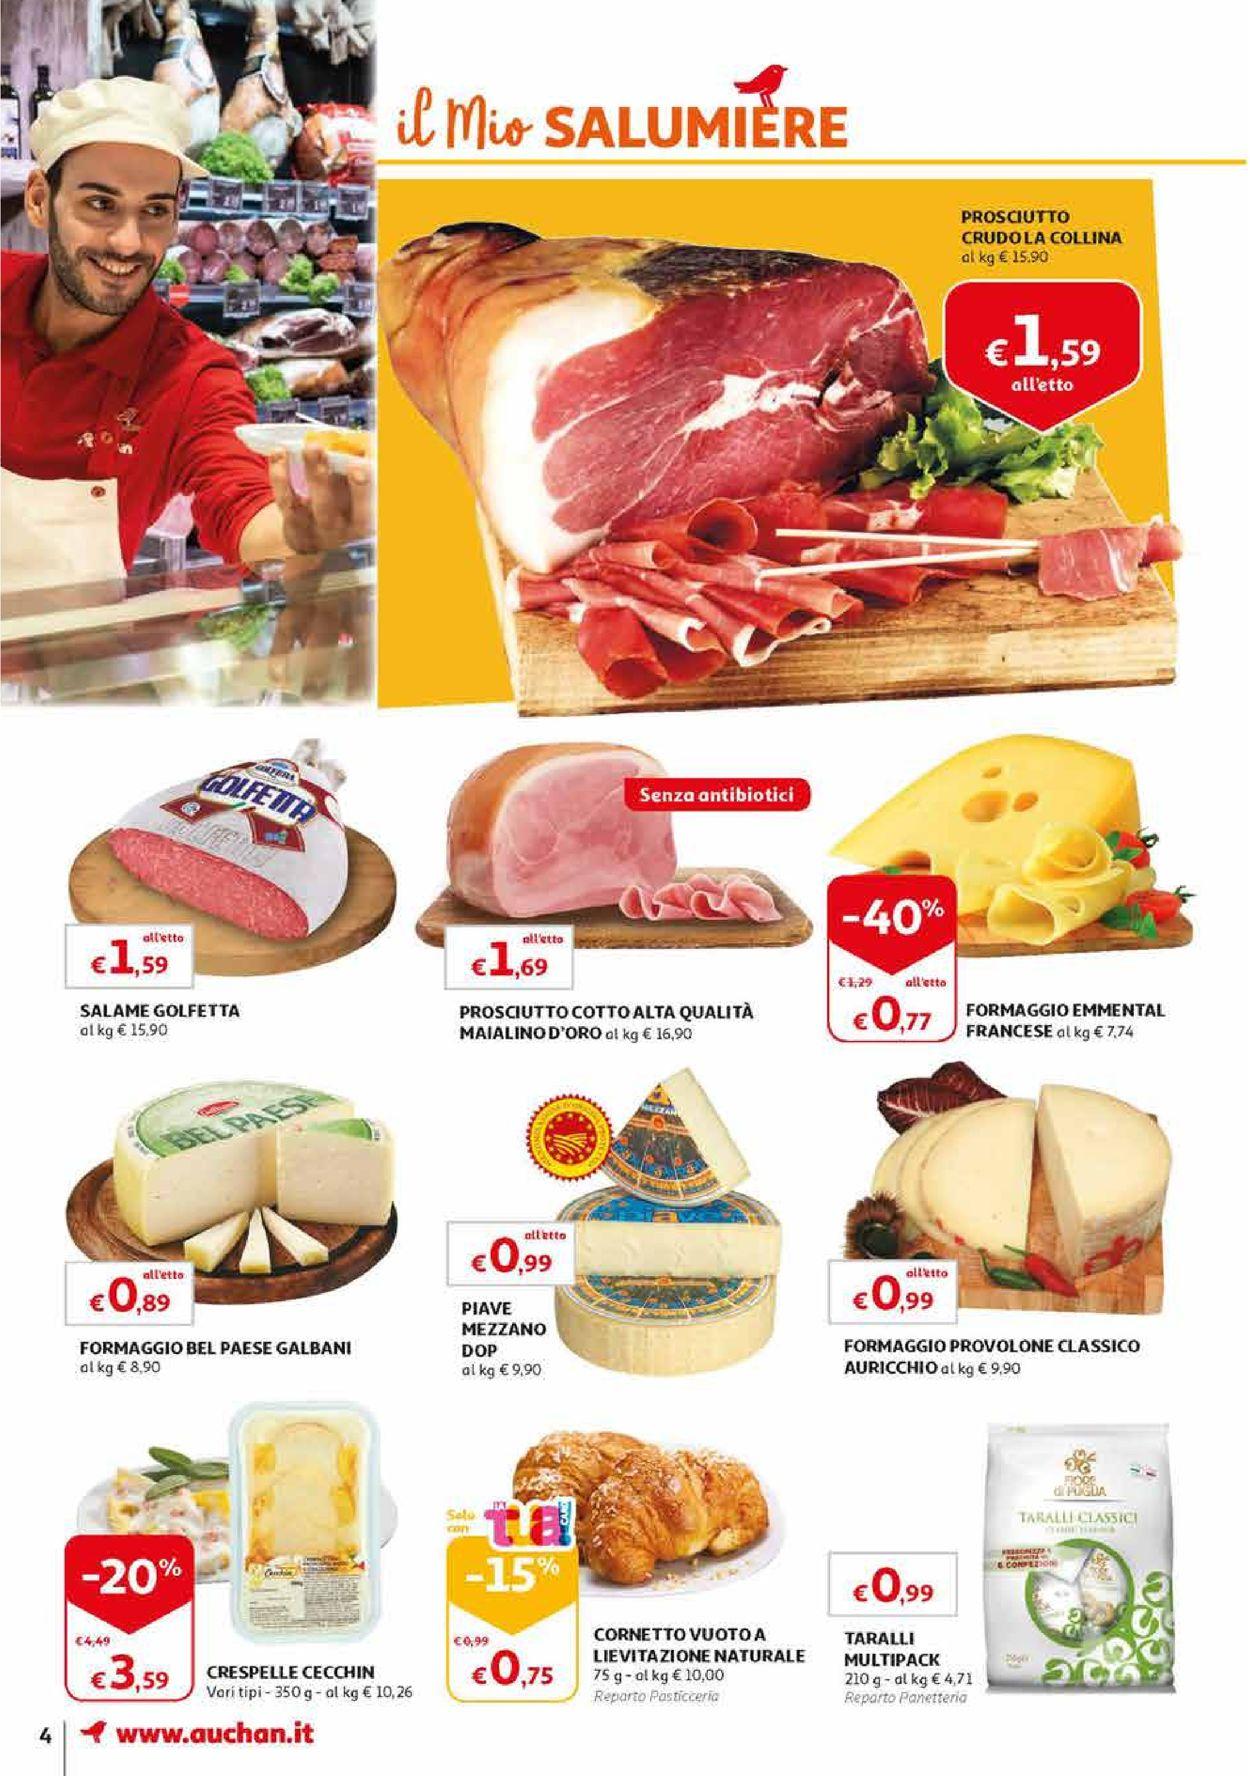 Volantino Auchan - Offerte 09/08-19/08/2019 (Pagina 4)